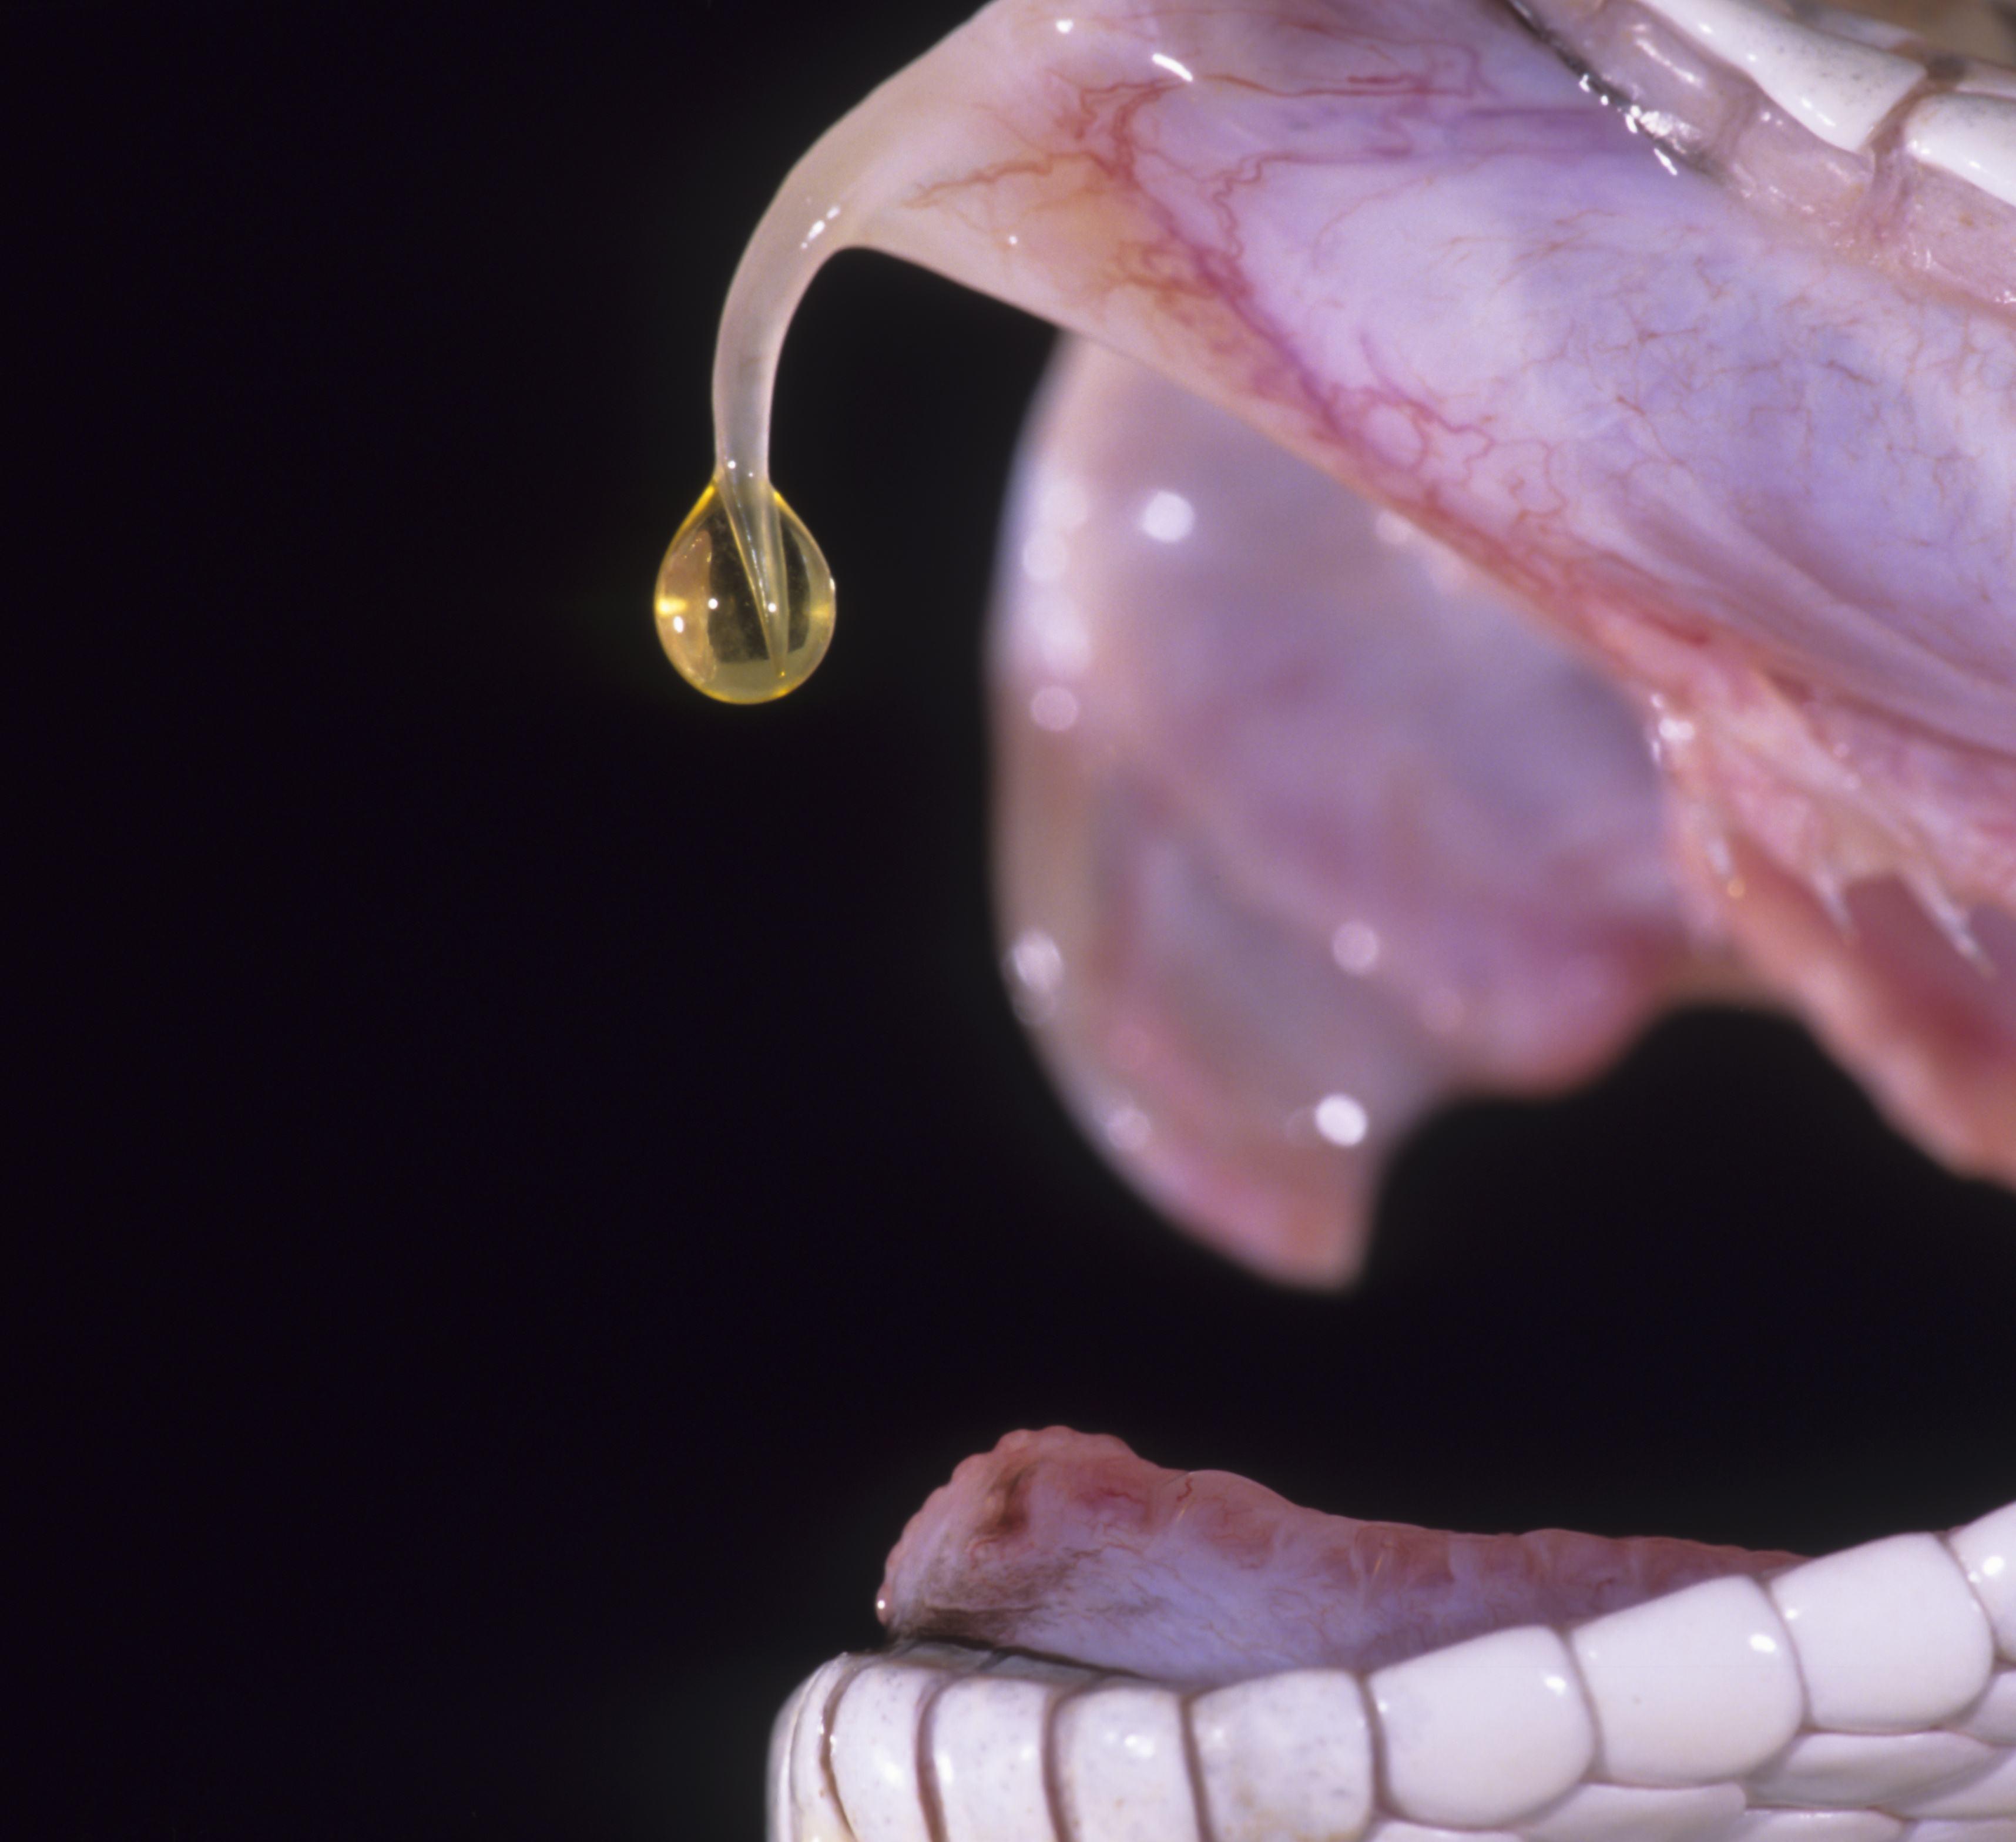 Snake venom droping